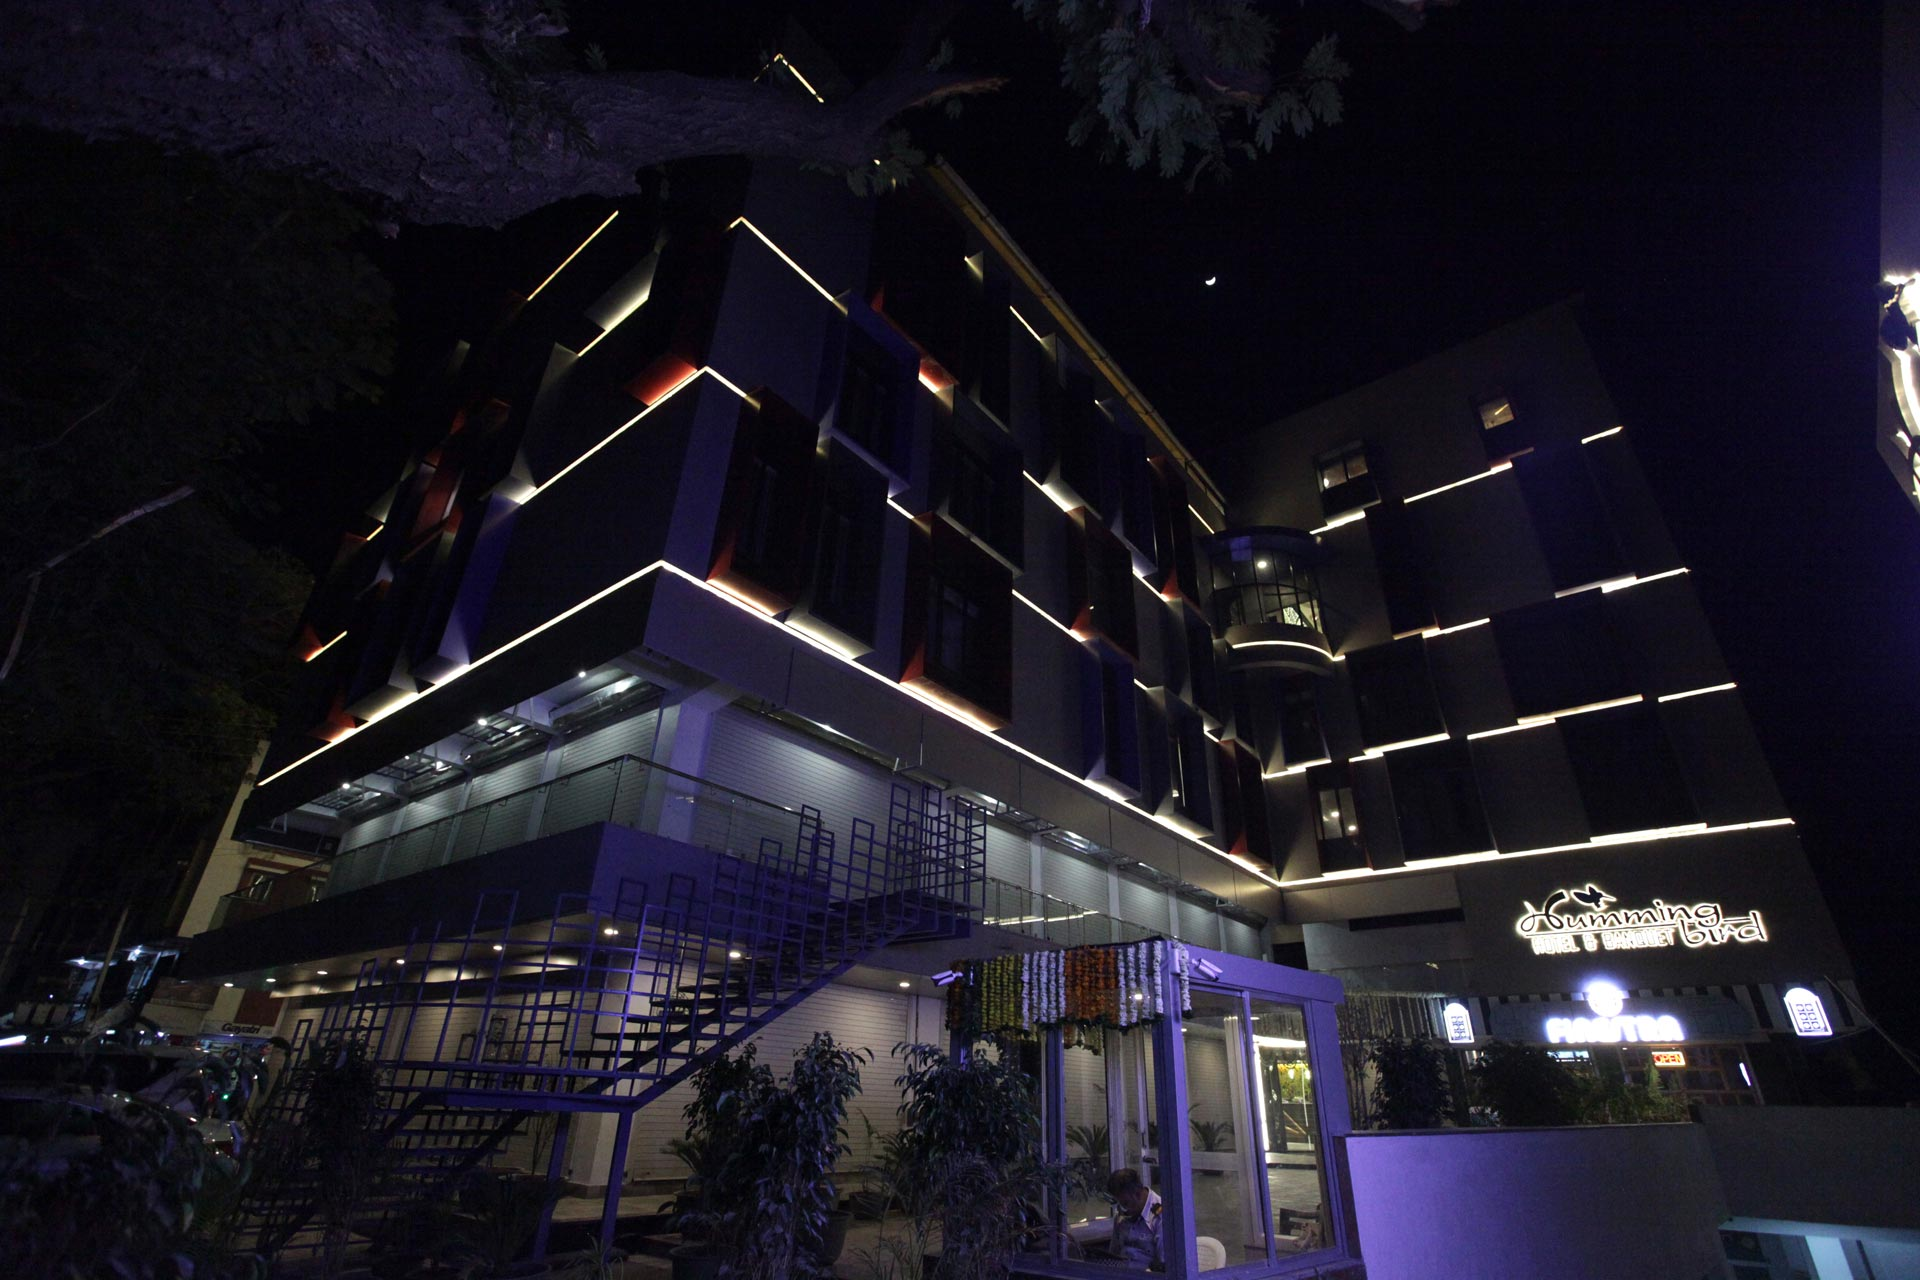 Hummingbird hotel outside night view